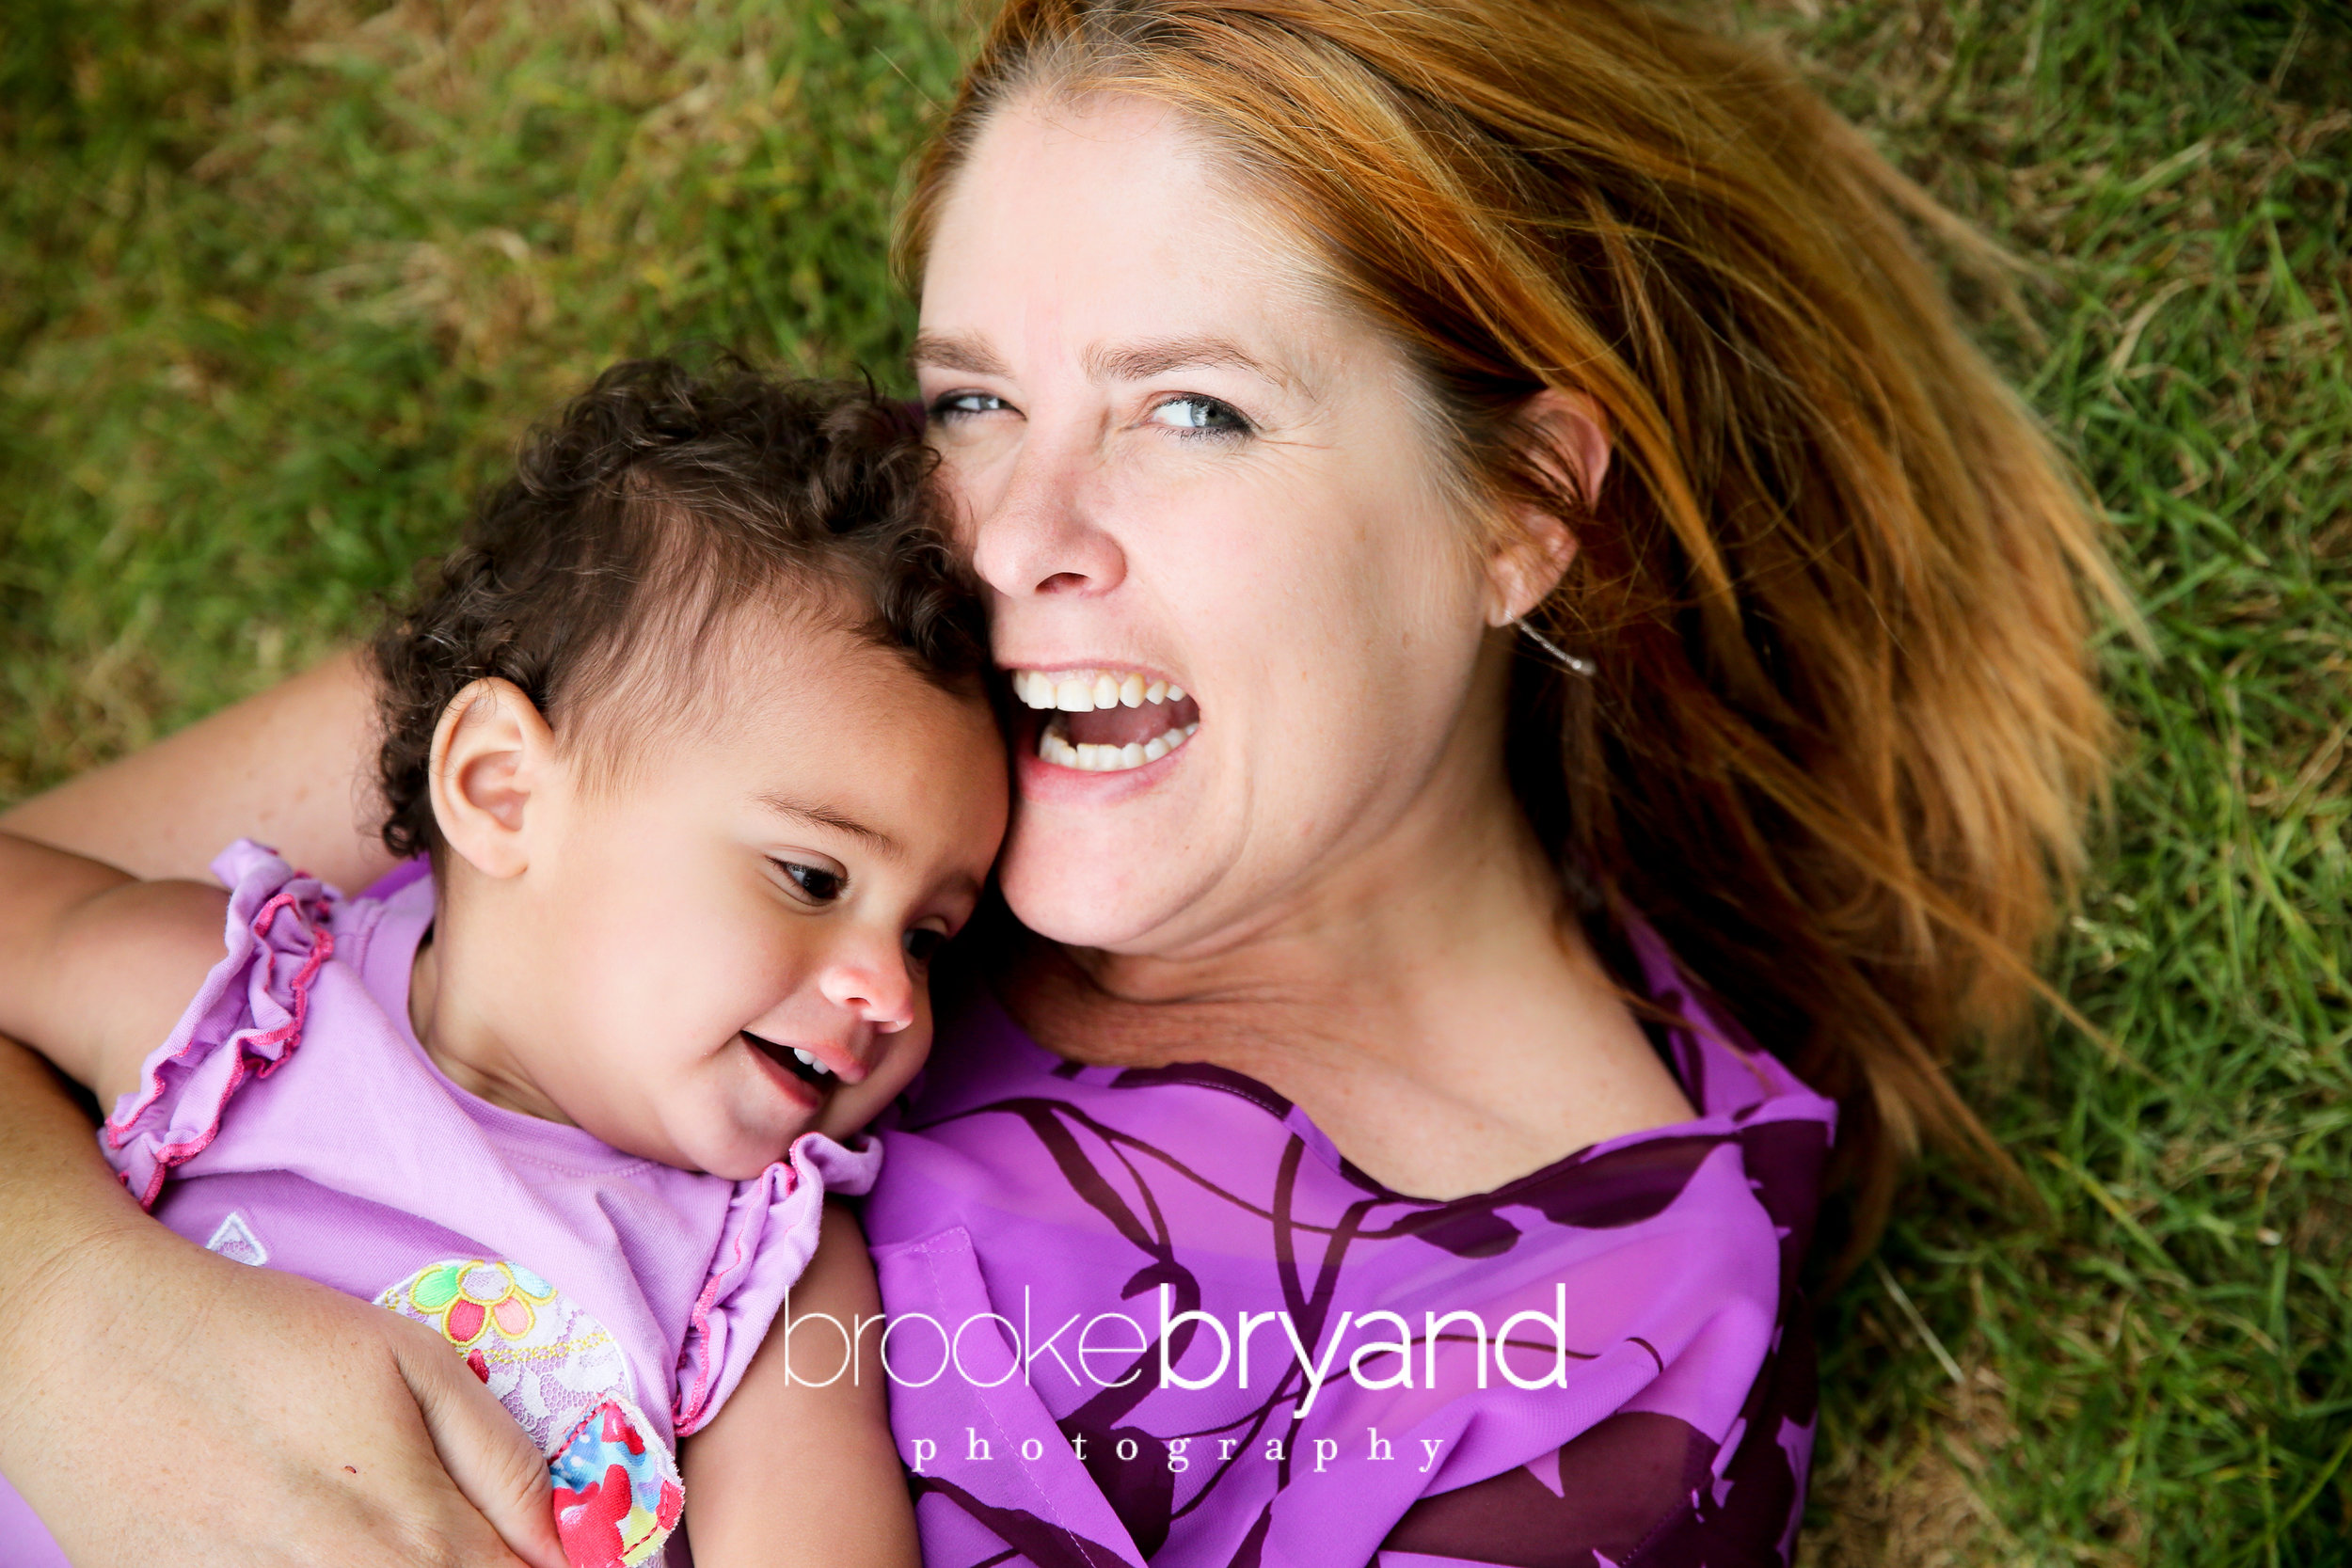 Brooke-Bryand-Photography-San-Francisco-Family-Photographer-First-Year-Photos-Palace-of-Fine-Arts-Family-Photos-IMG_0077.jpg